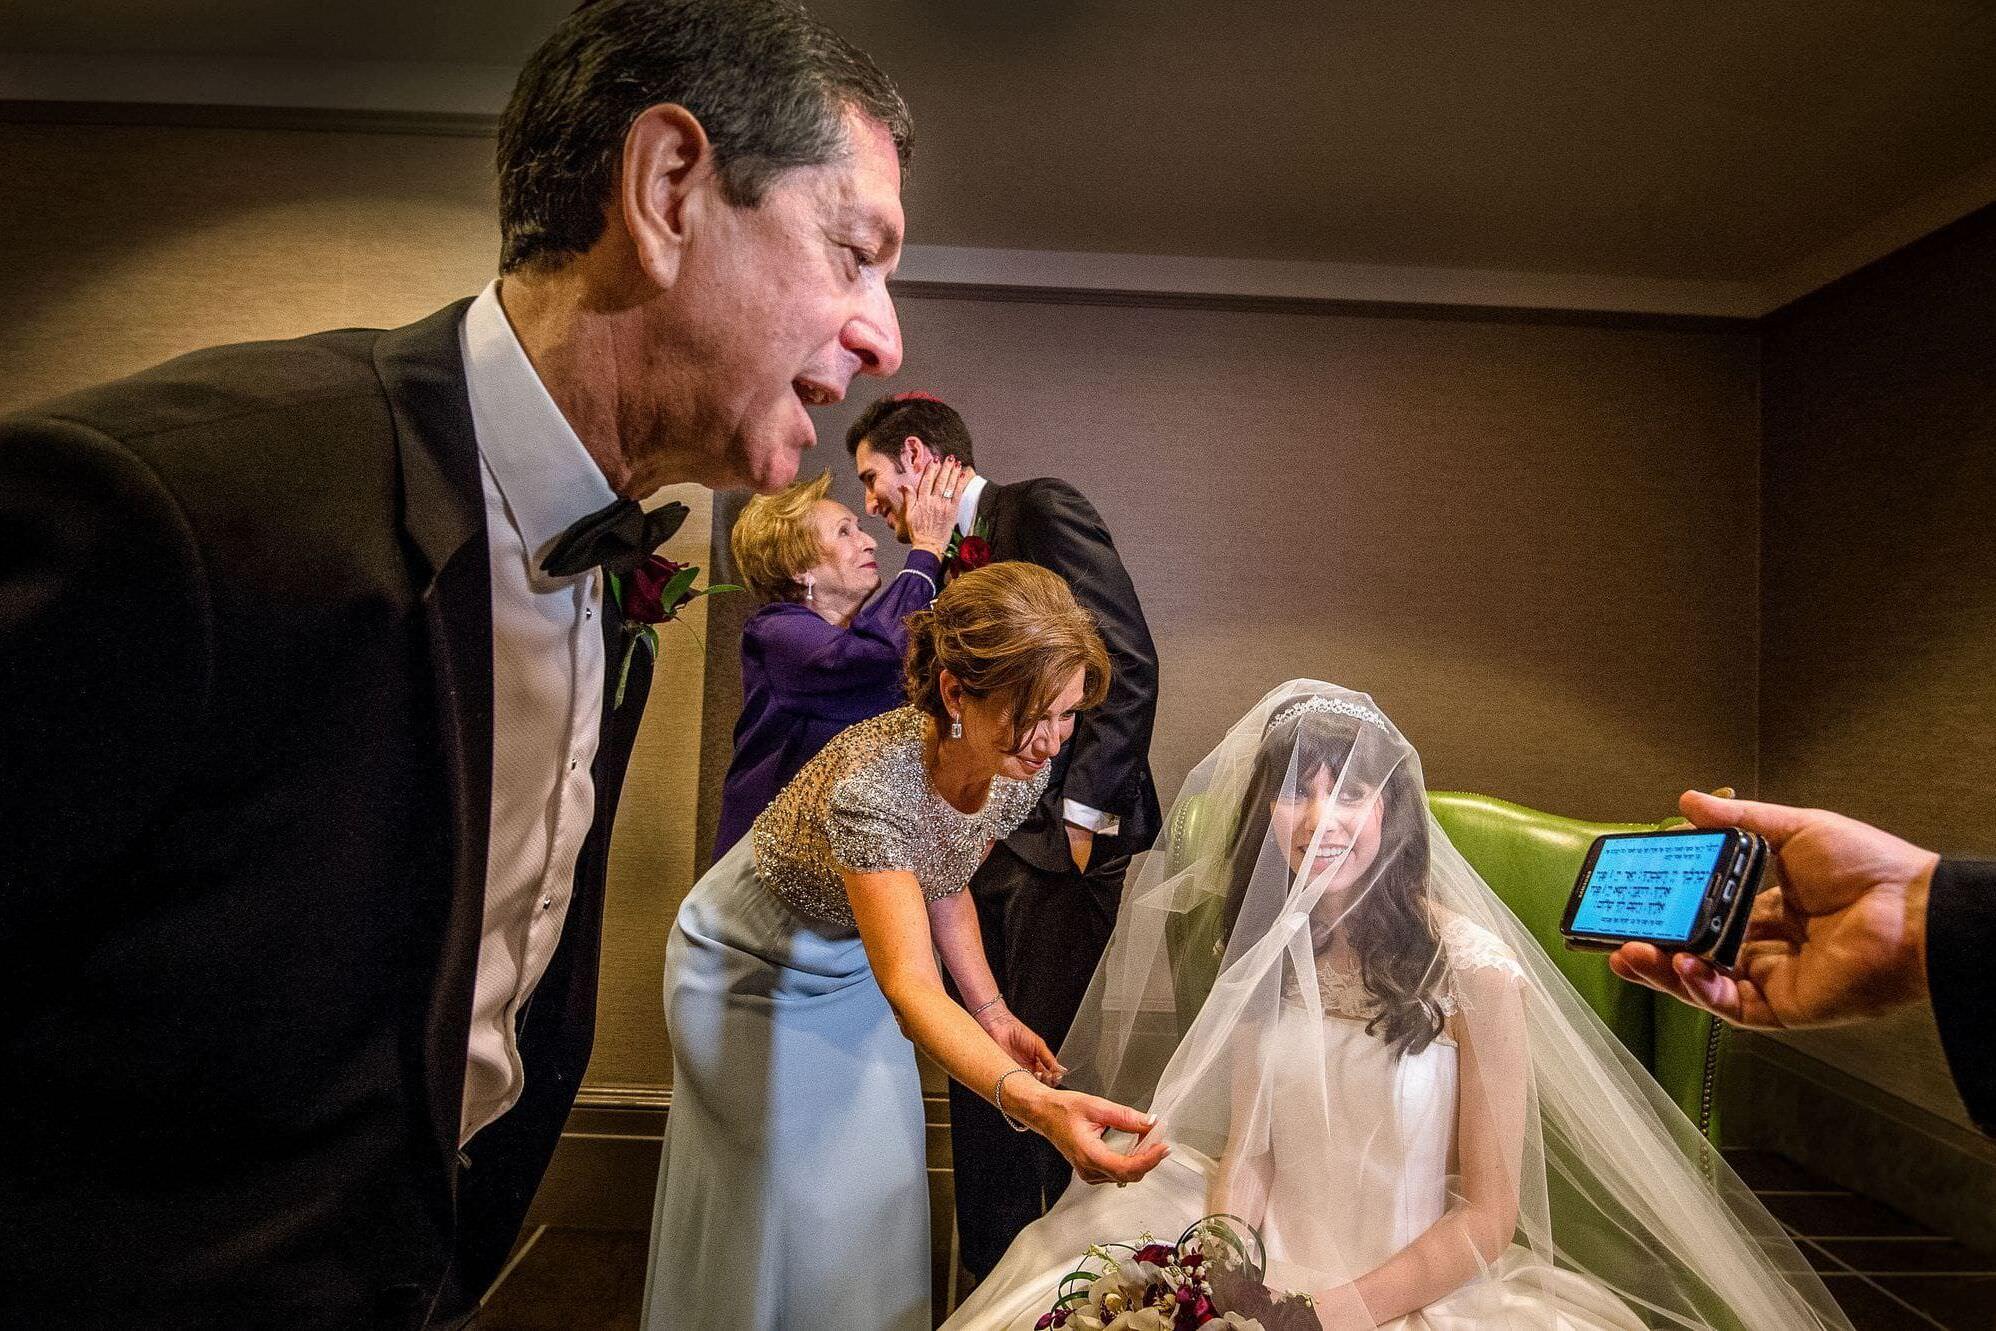 Mark-Seymour-Wedding-Photographer-UK-06 18